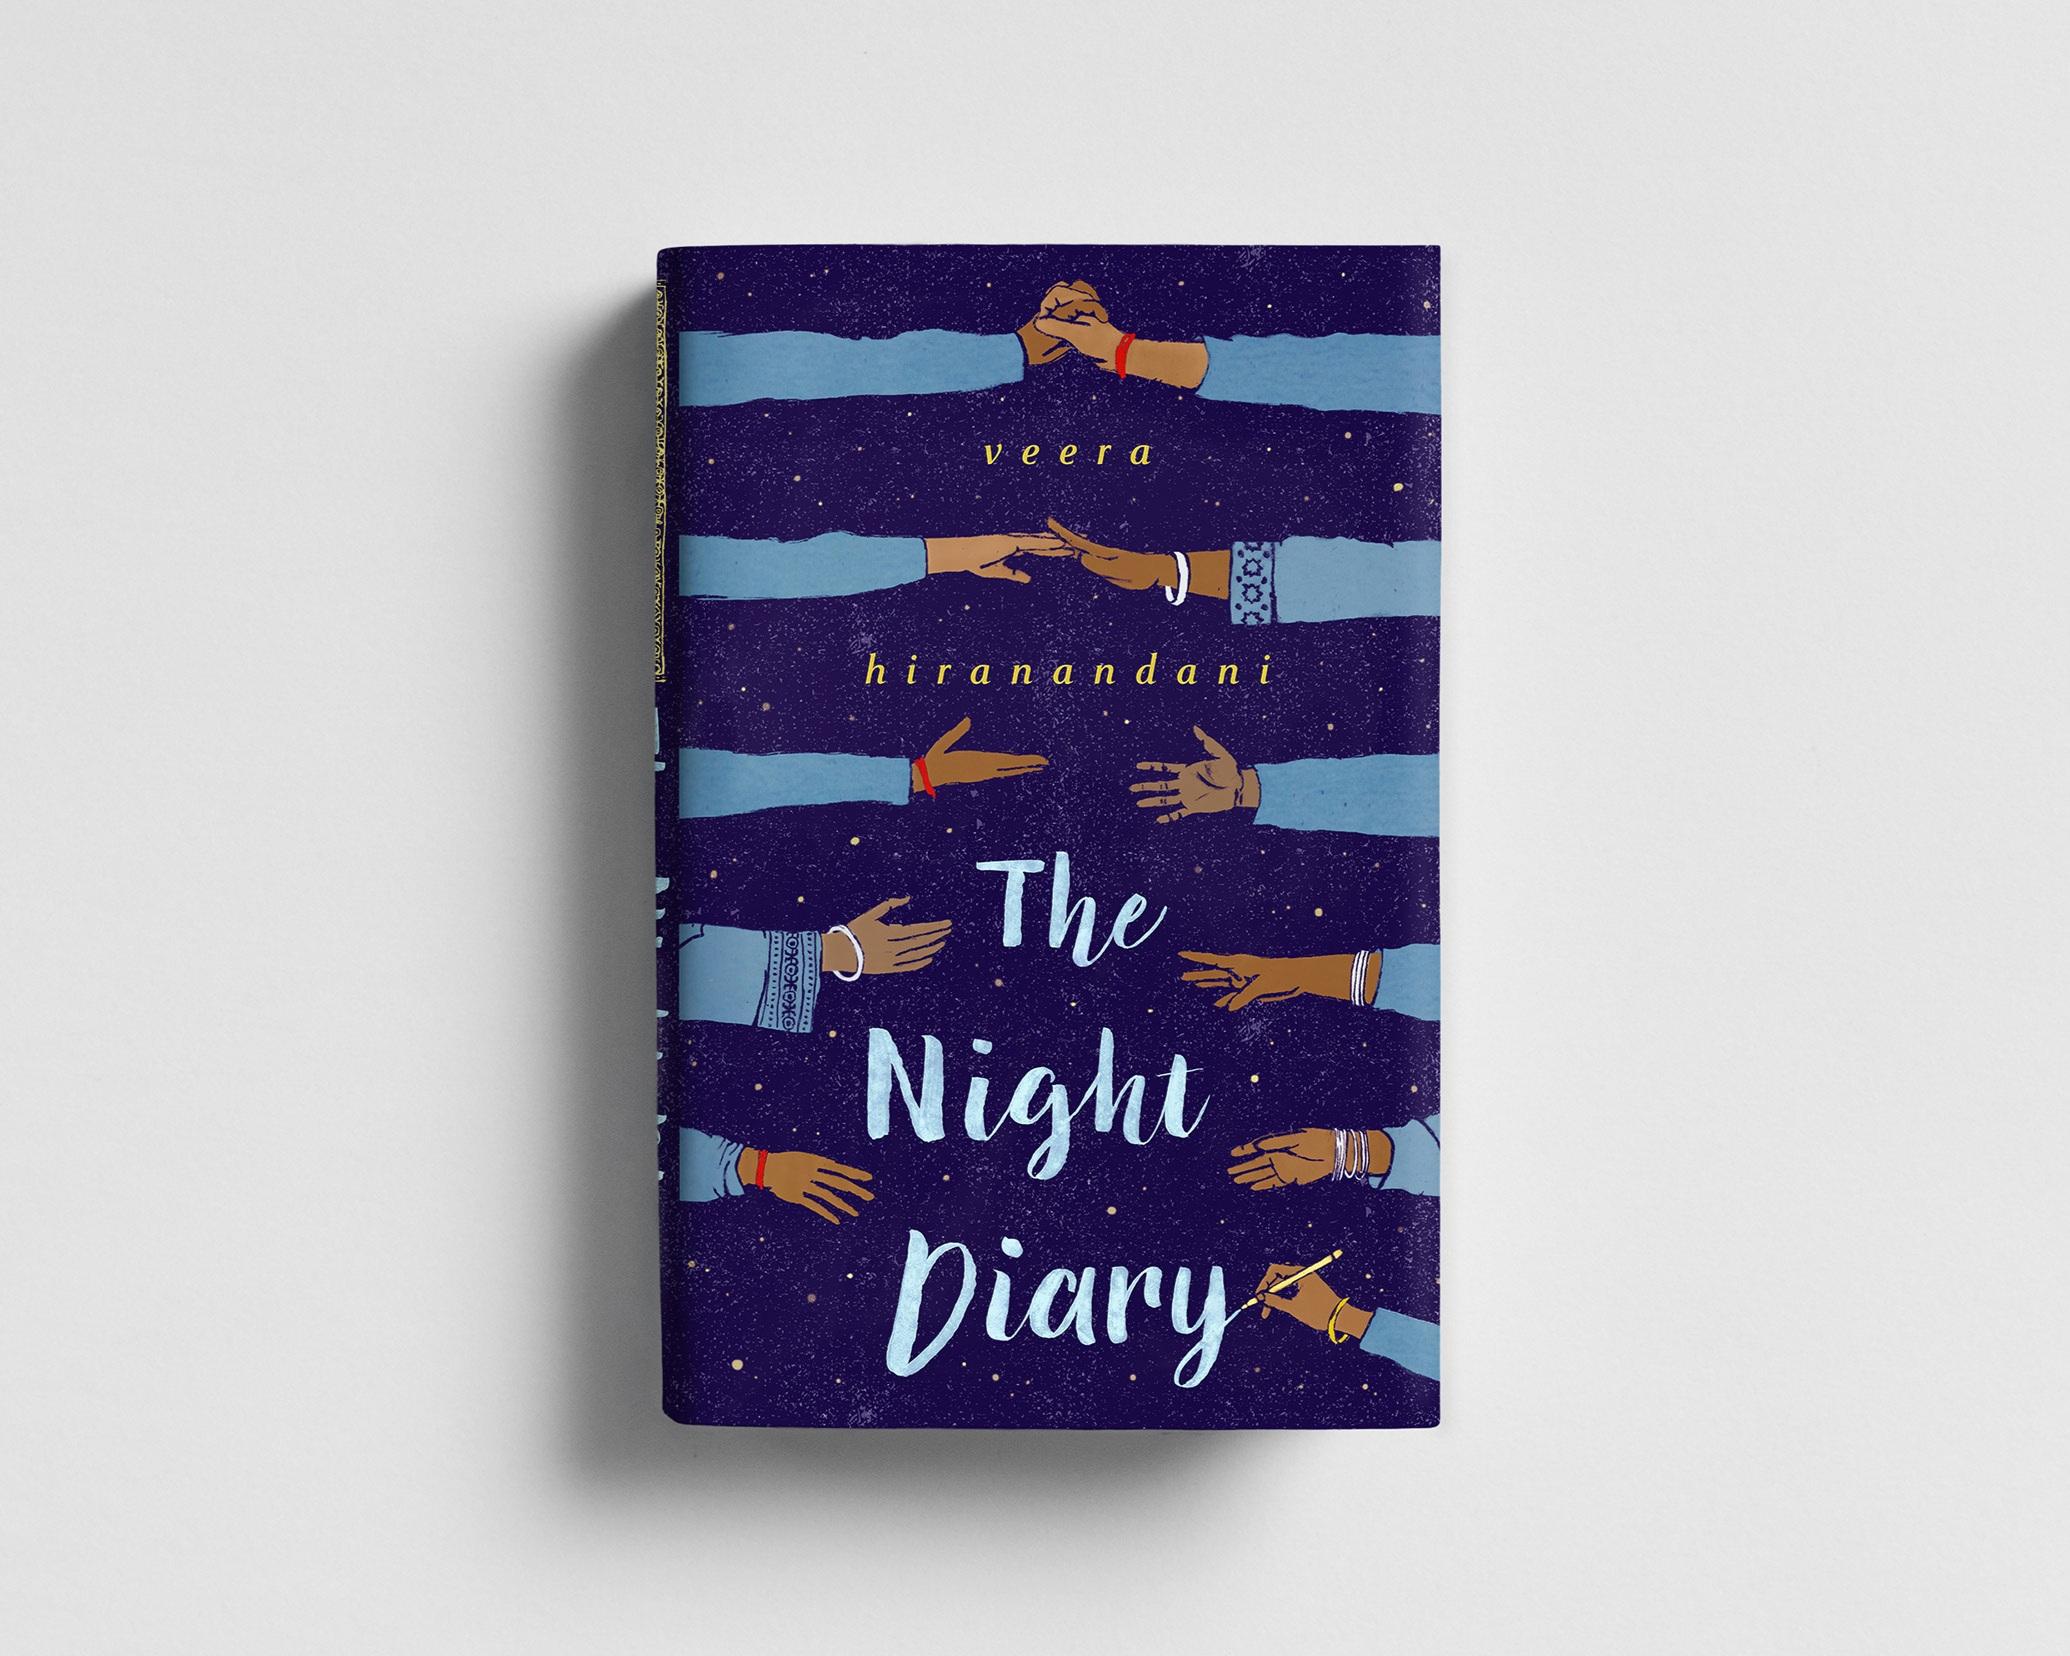 nightdiary_front.jpg